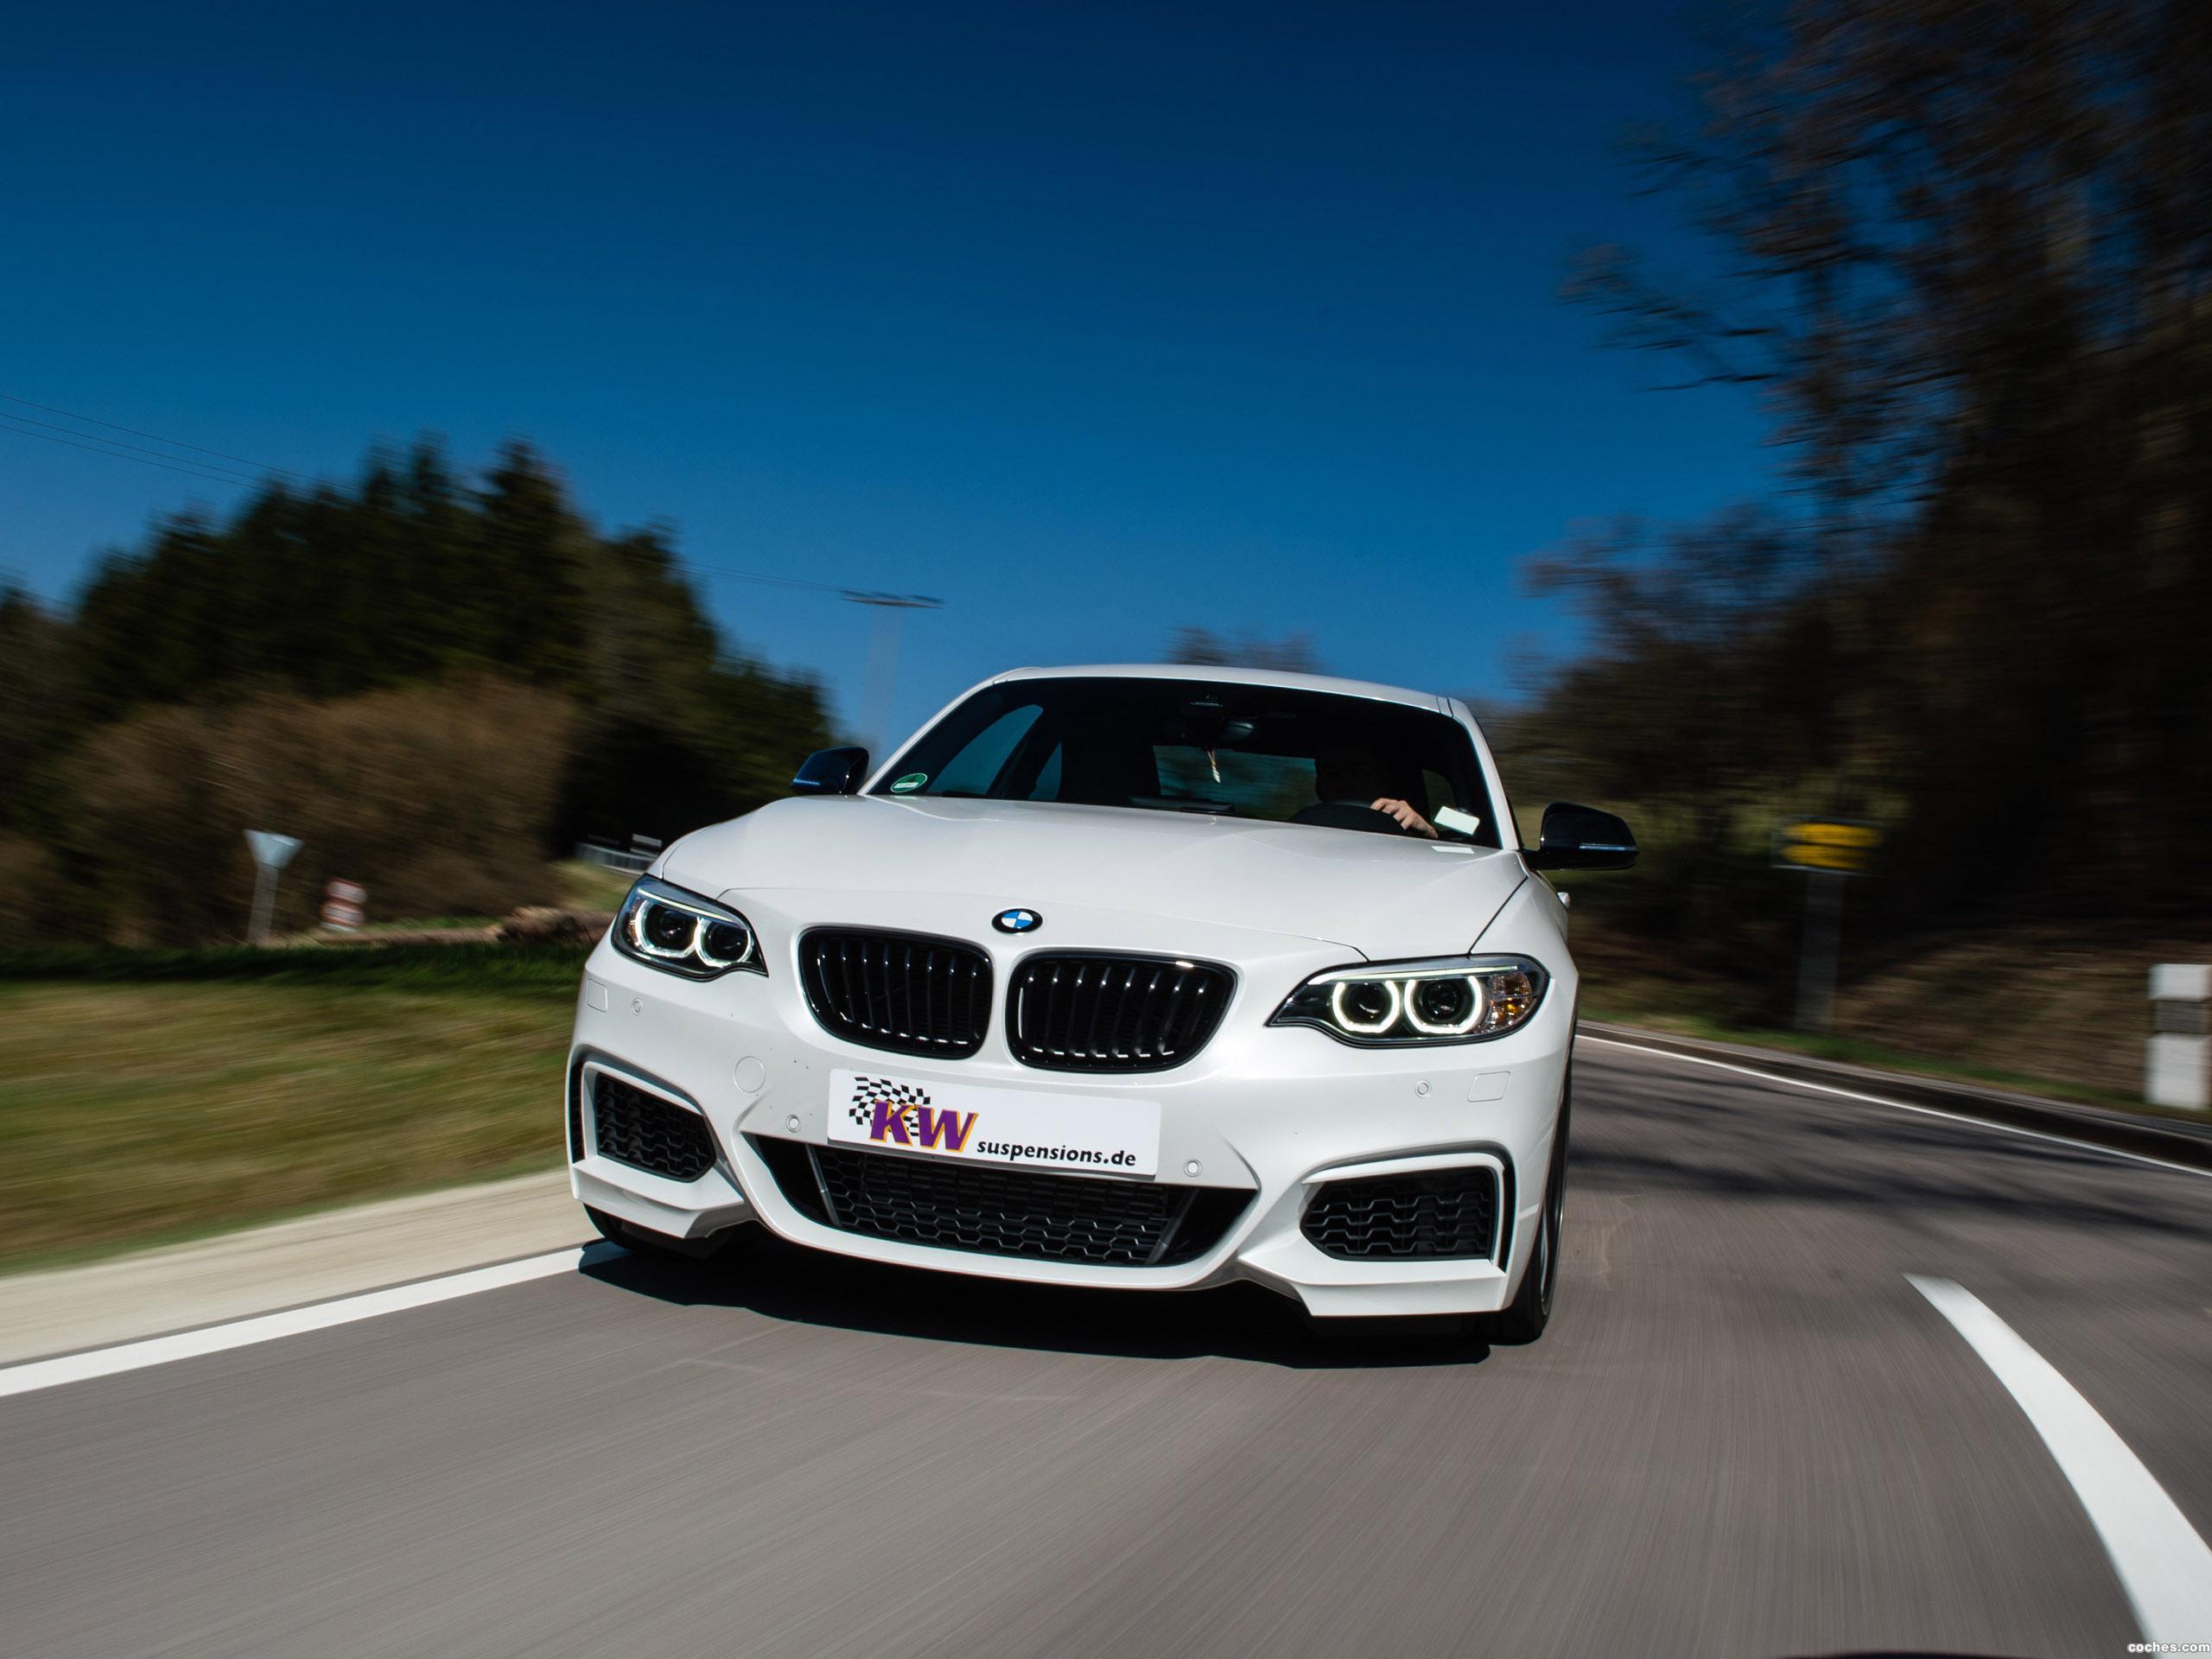 Foto 1 de BMW Serie 2 M235i KW Adaptive DDC Coilovers 2014